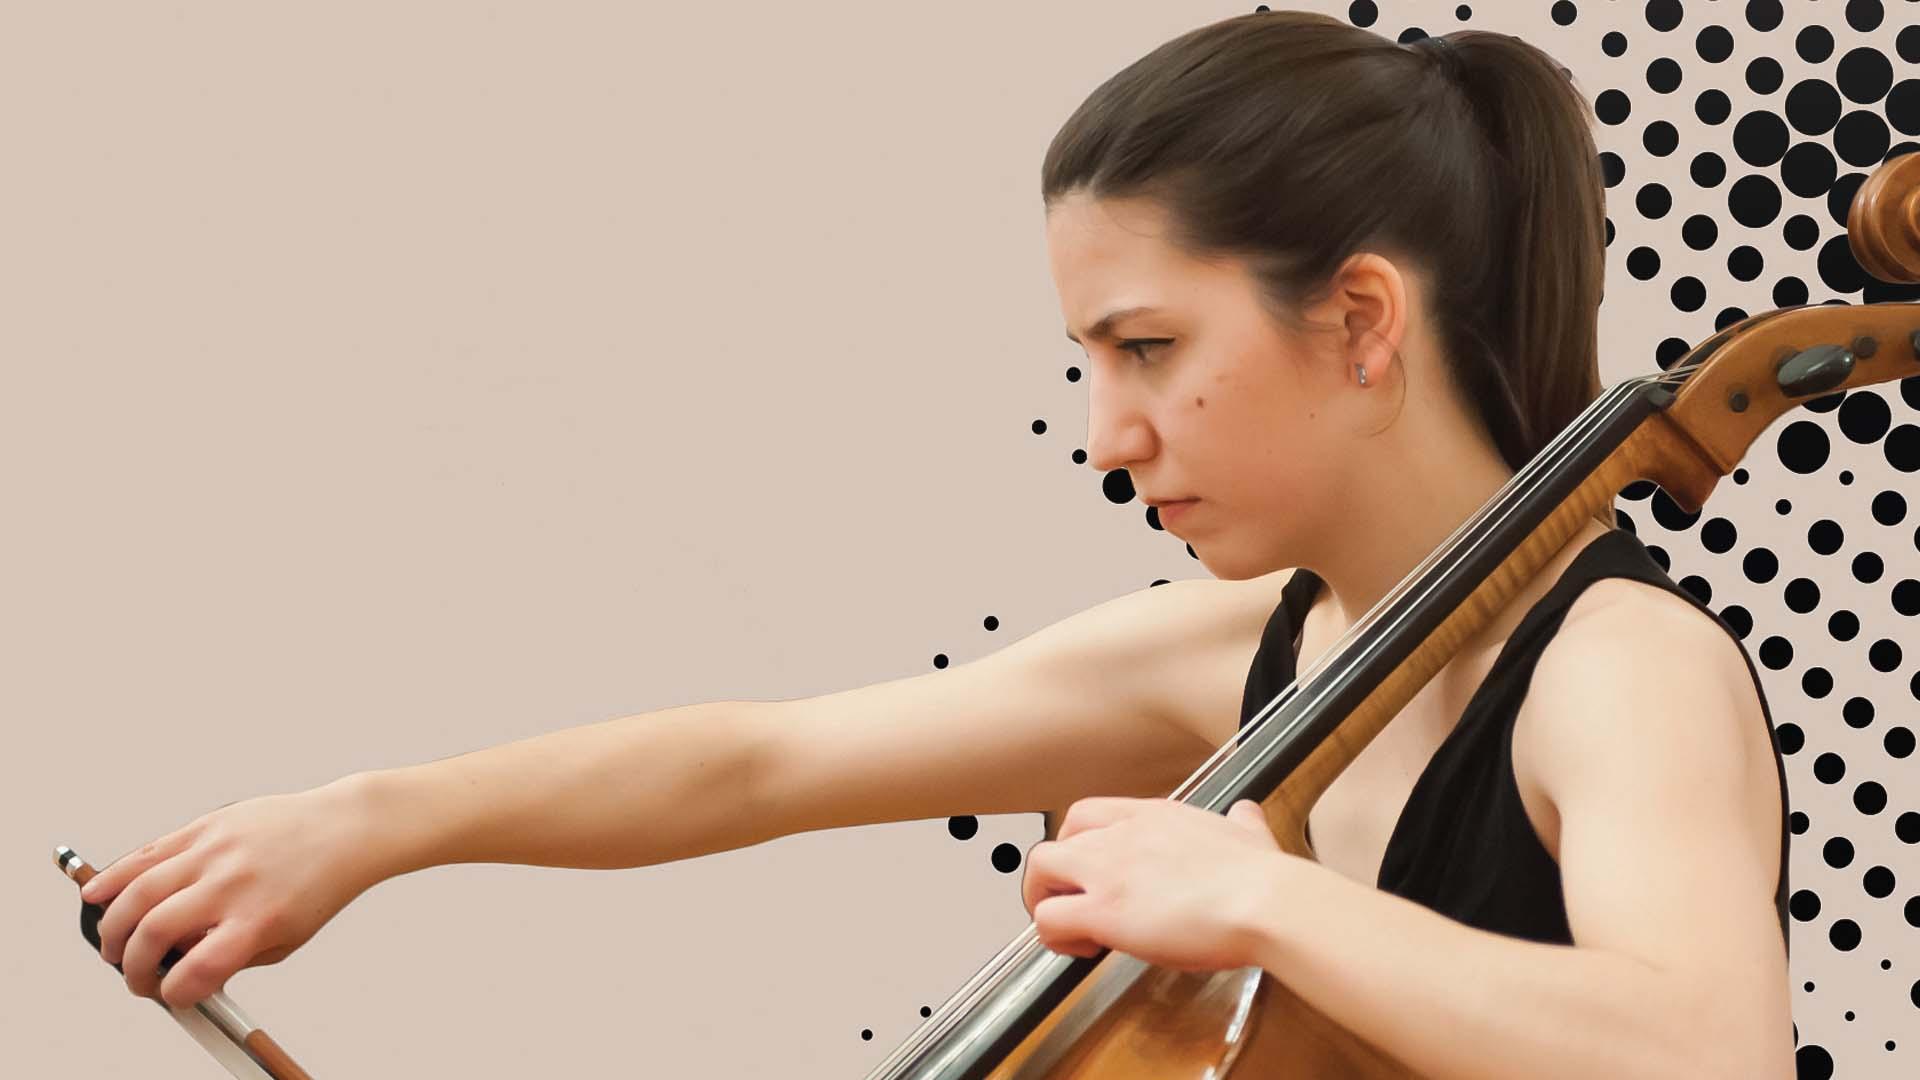 Koncert trija Nobile u Zadru